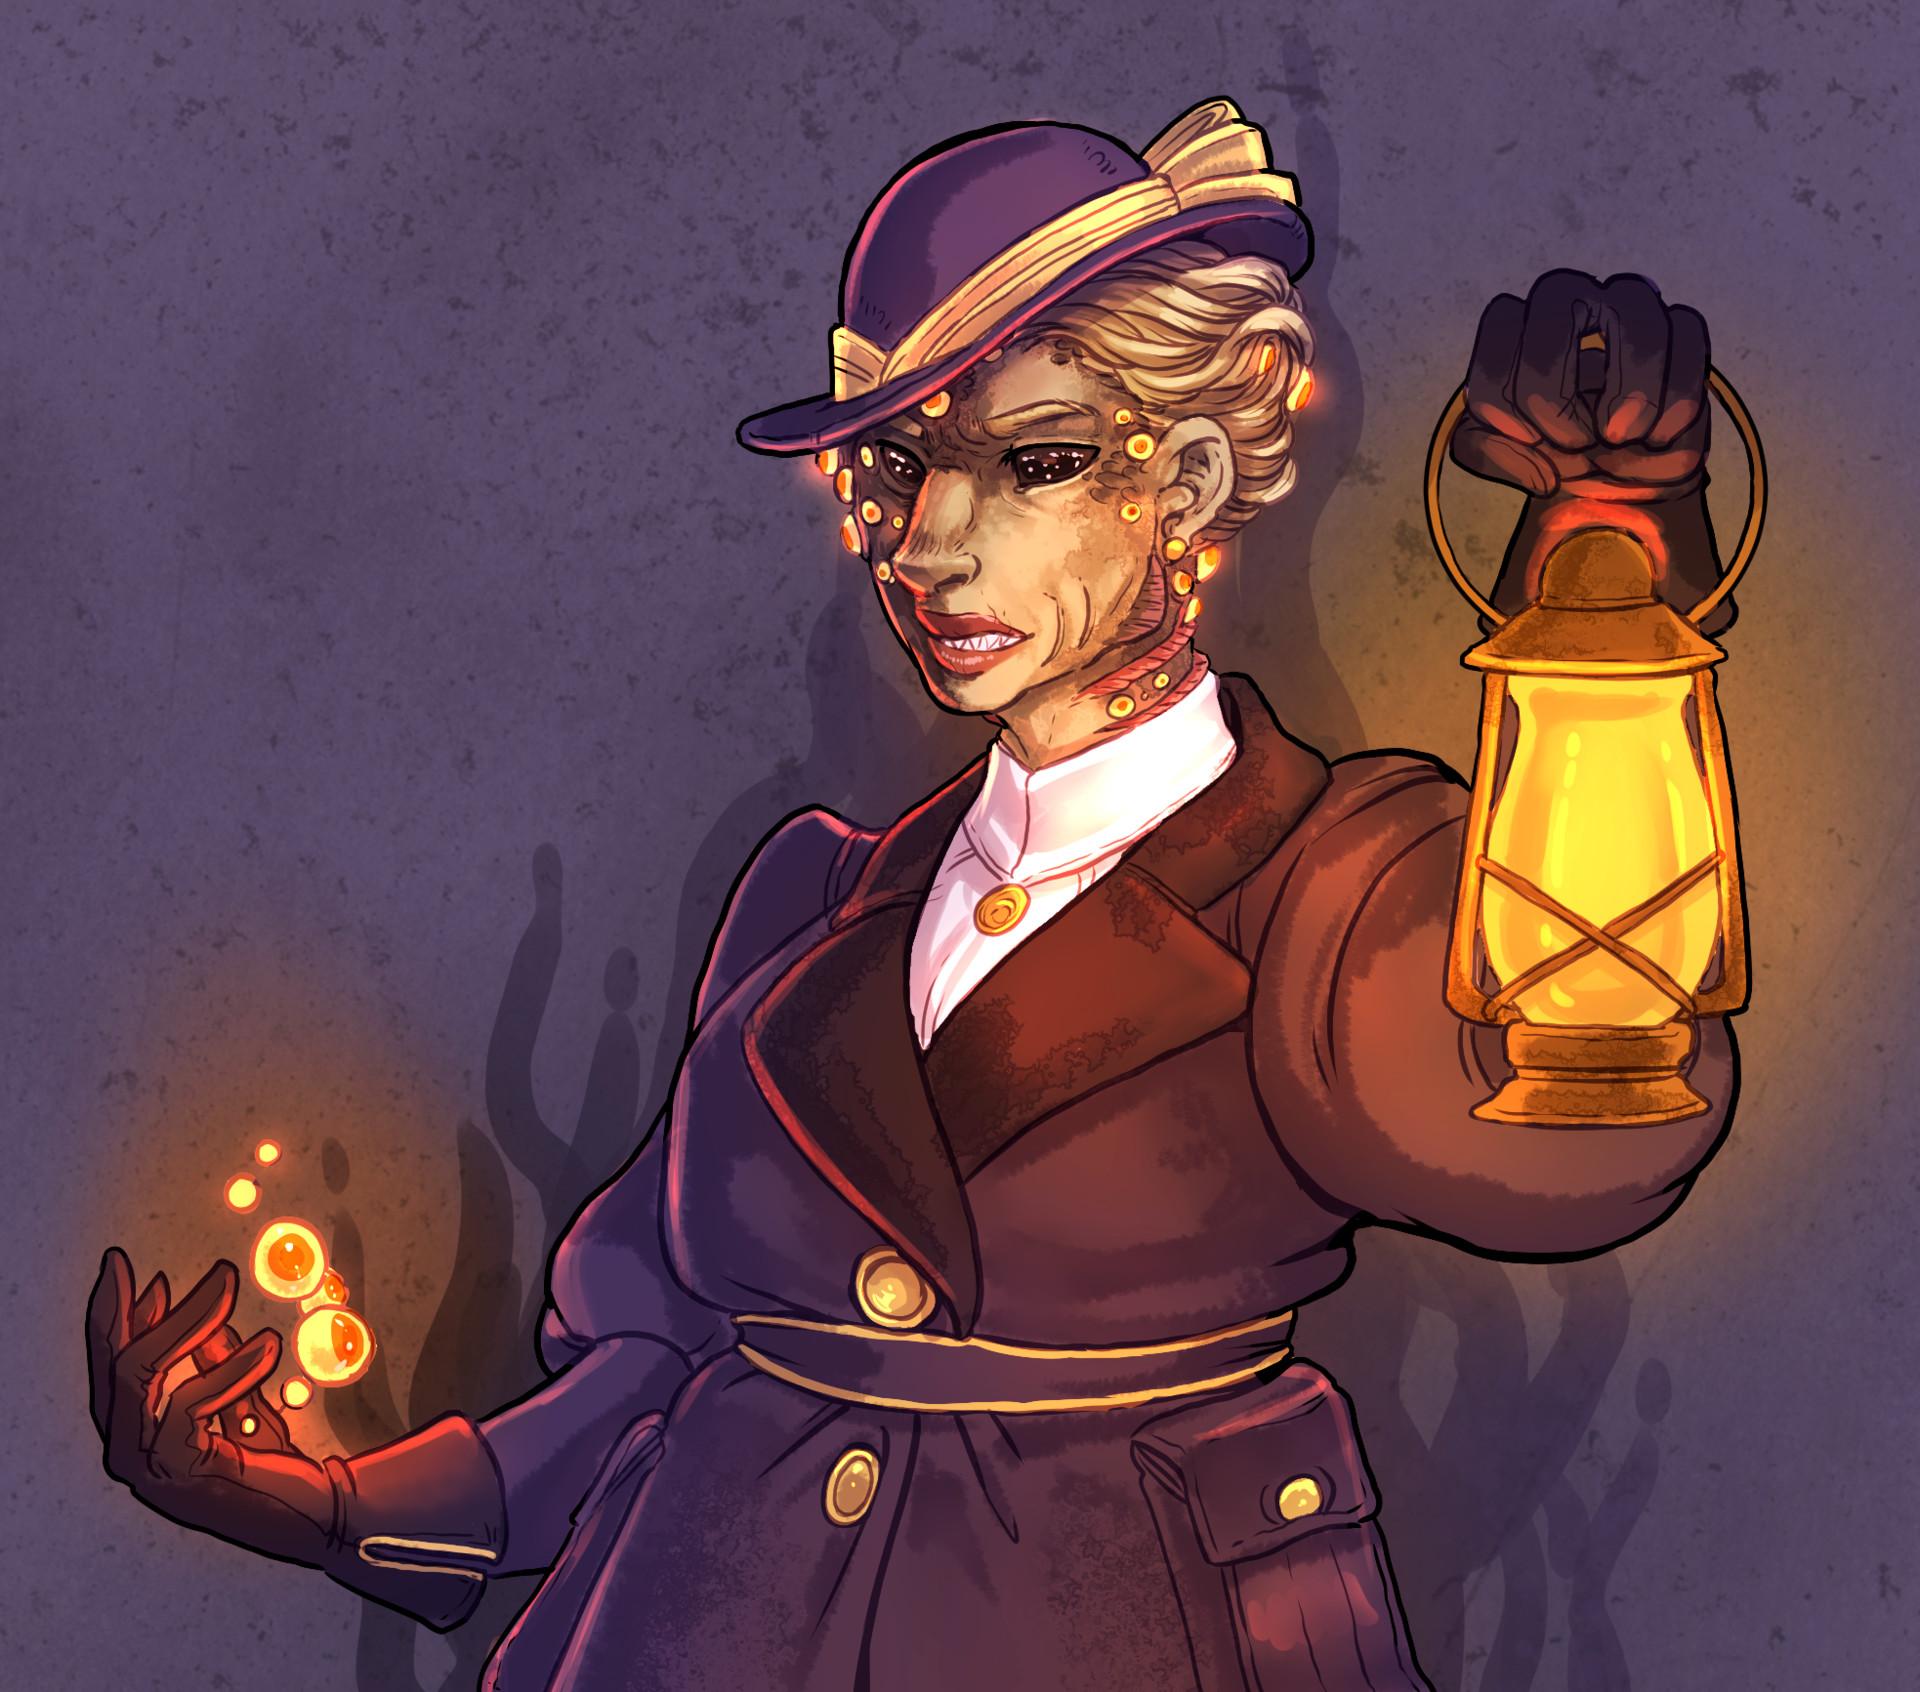 Anna landin eldritchhorrorwoman illustration closeup